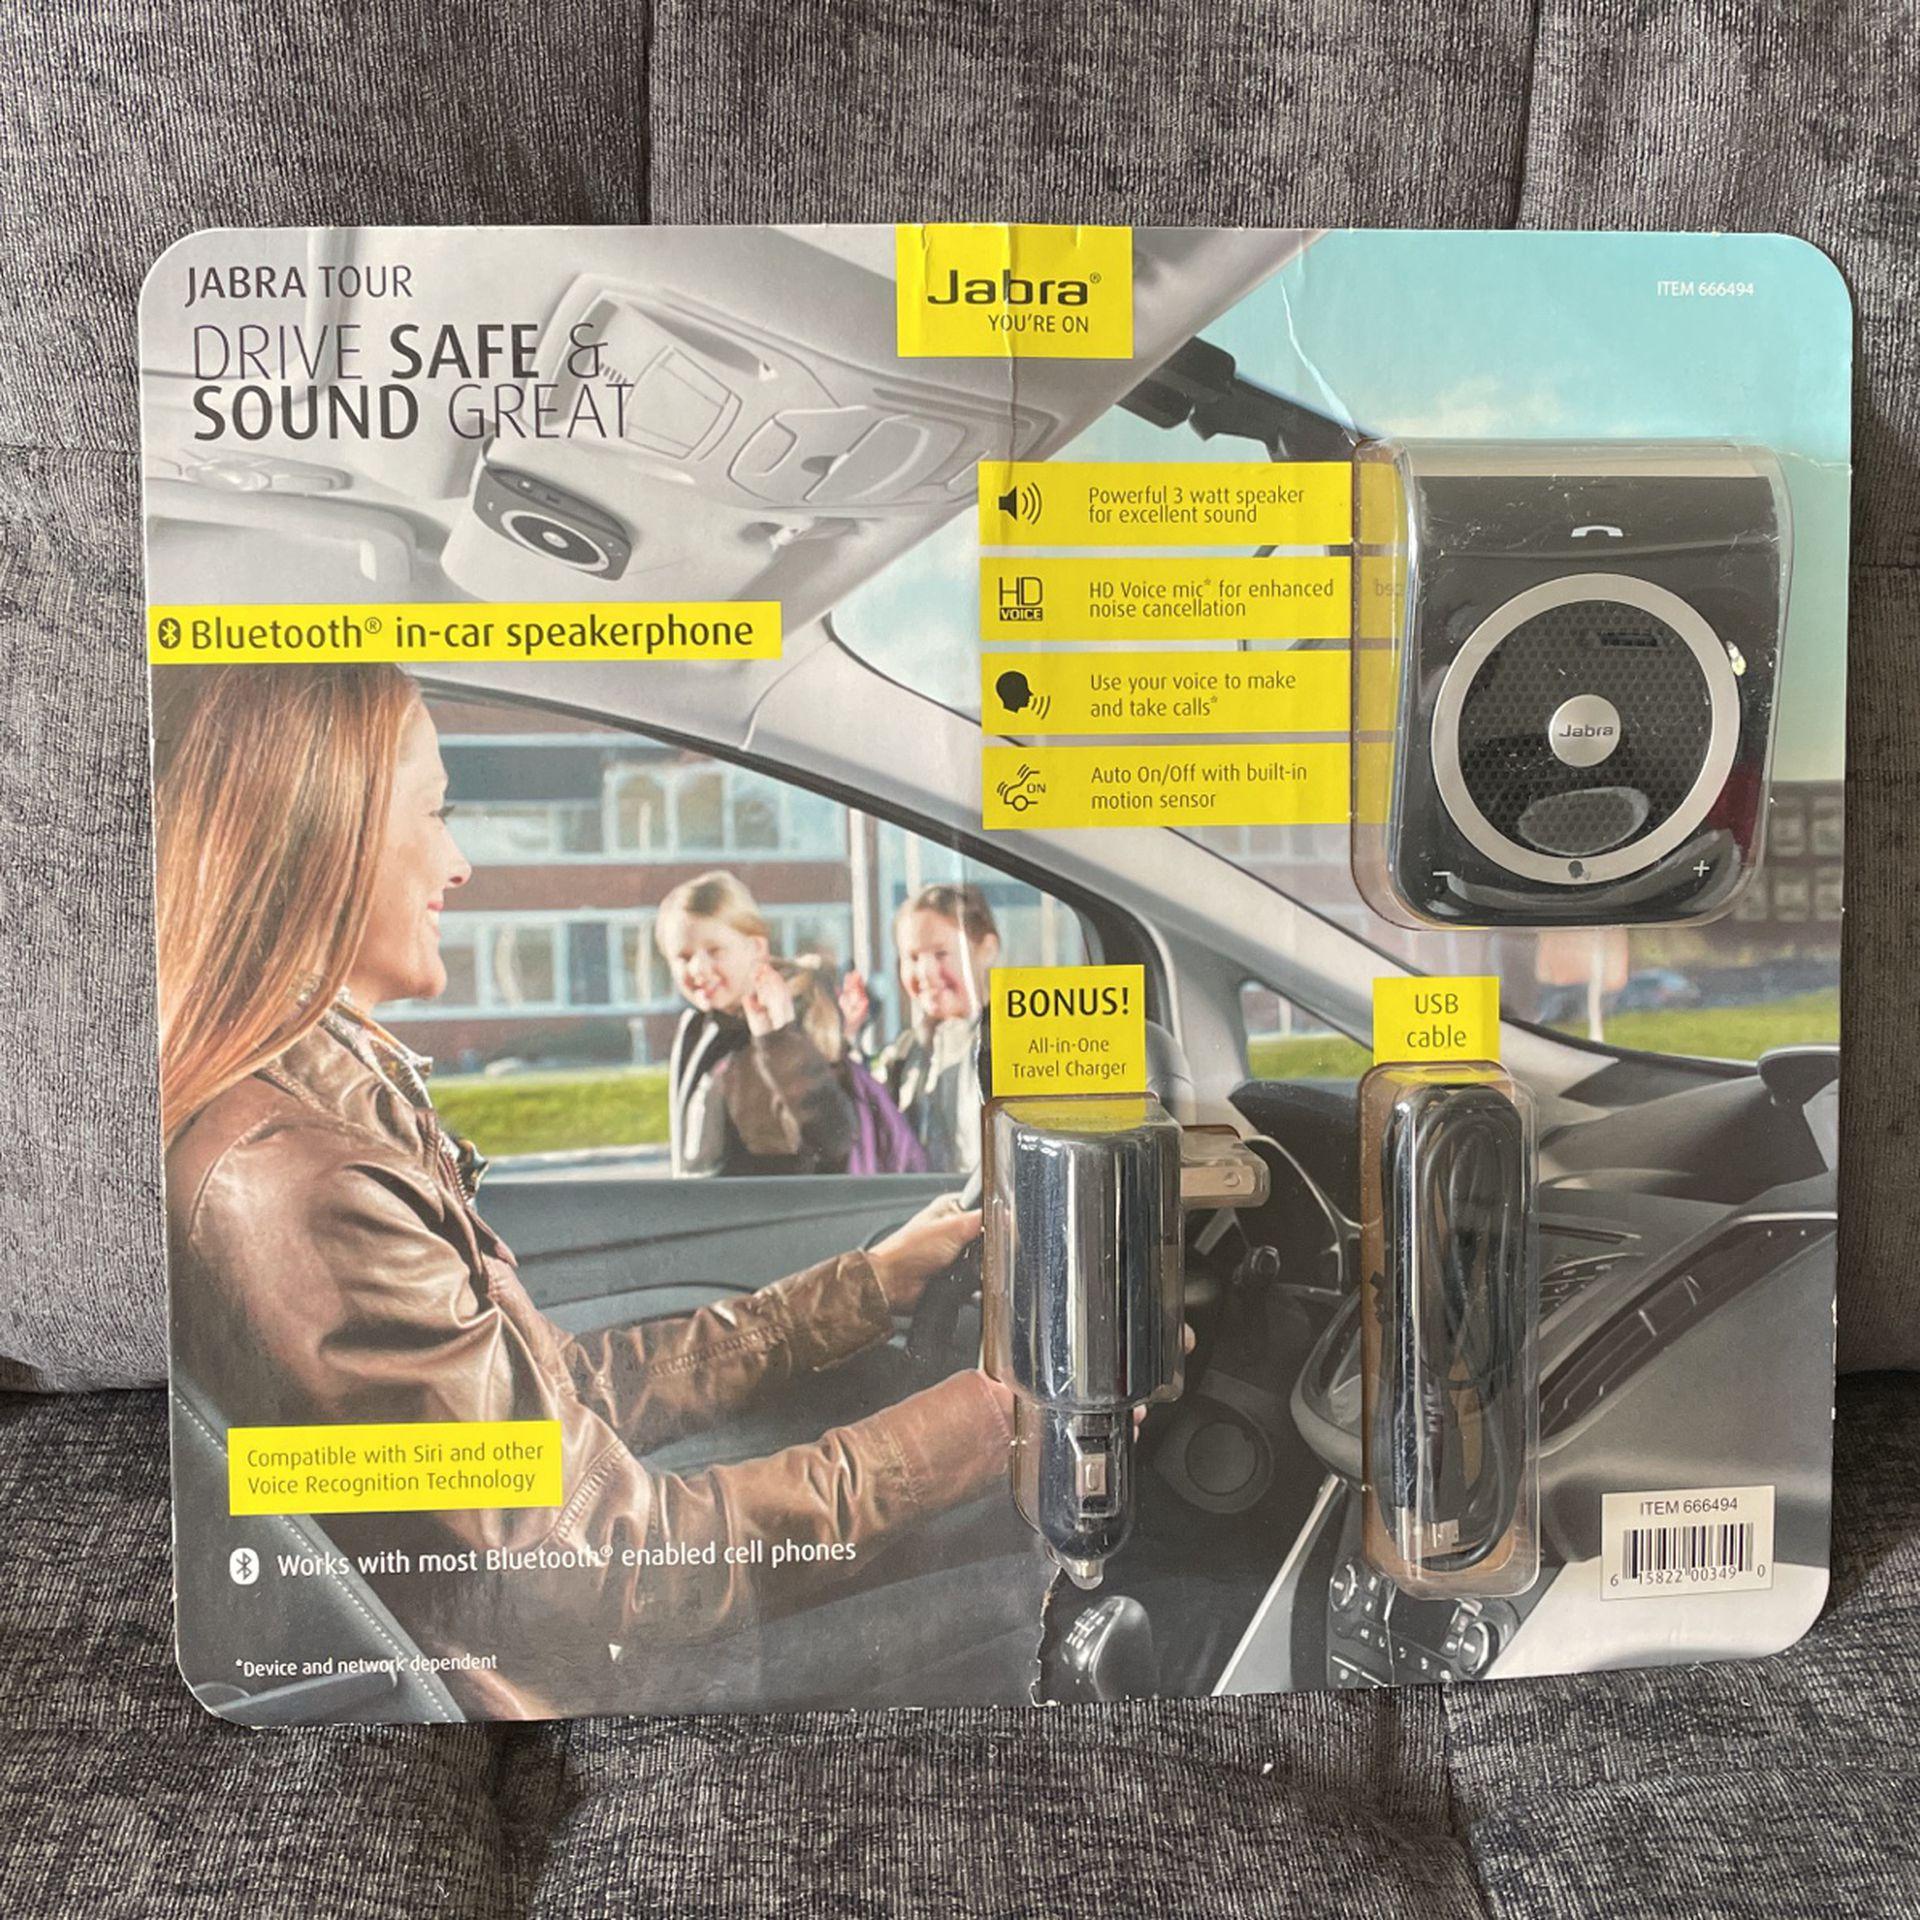 Jabra Bluetooth In-car Speakerphone